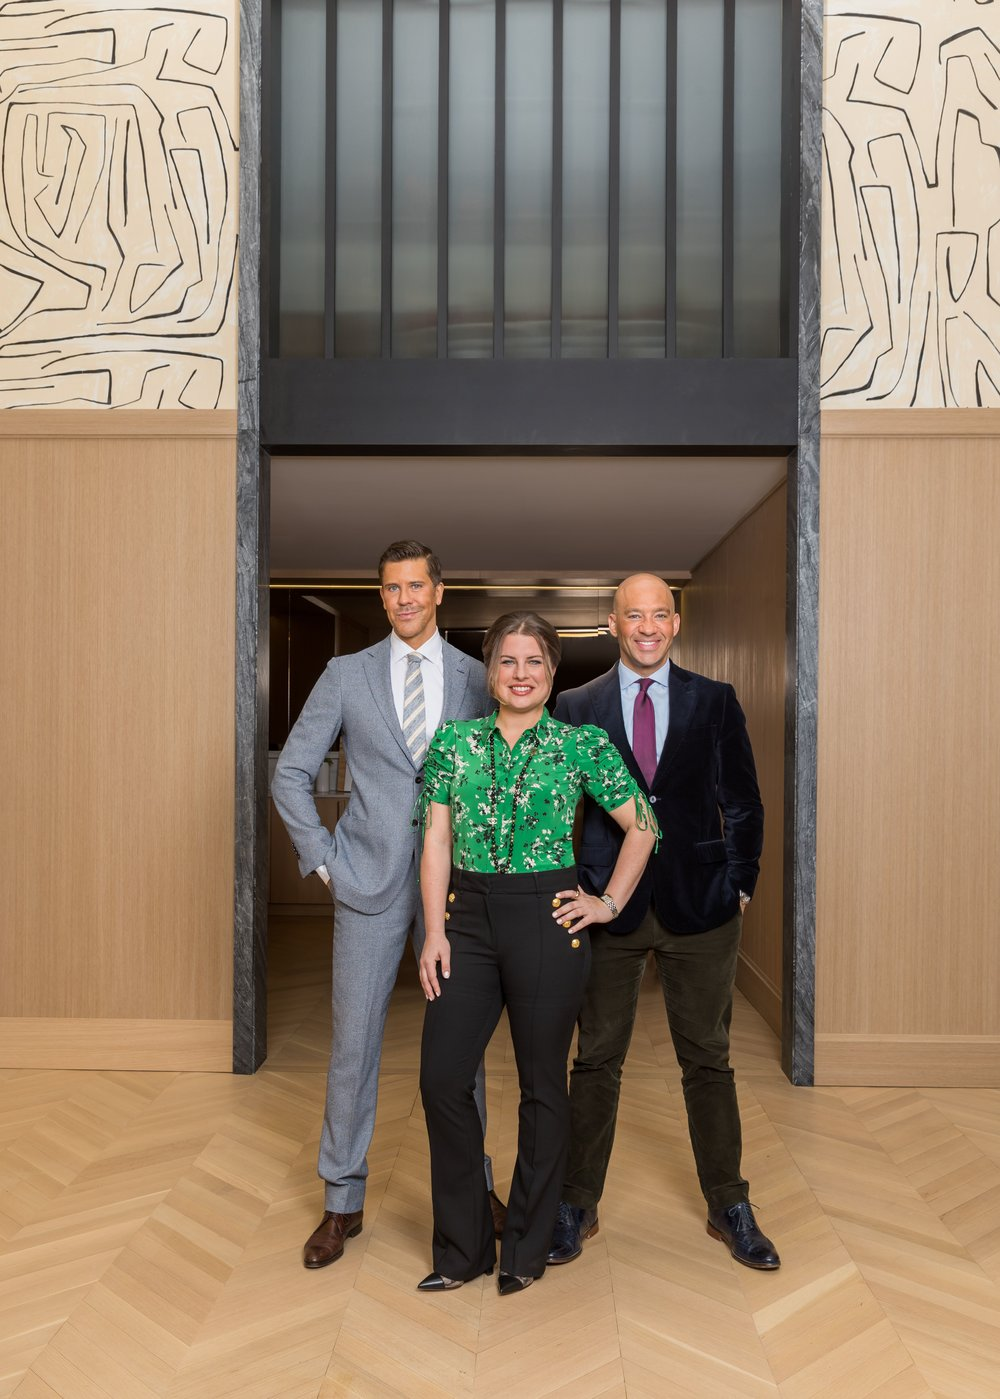 Fredrik Eklund, Jessica Peters, and John Gomes